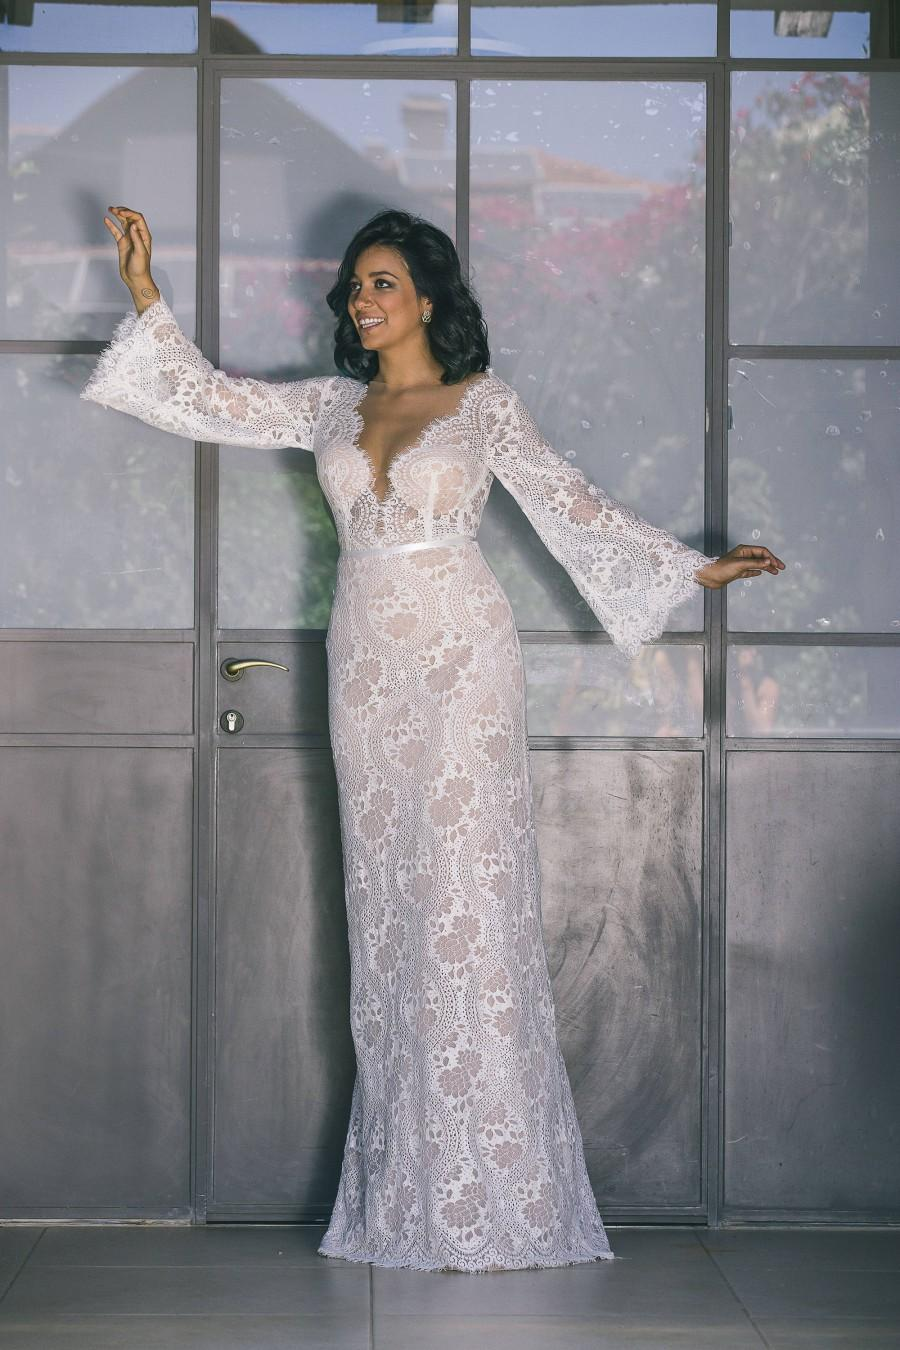 Mariage - Bohemian Wedding Dress, Boho Wedding Dress,  Backless Wedding Dress, Long Sleeve Wedding Dress, Lace Boho Wedding Dress